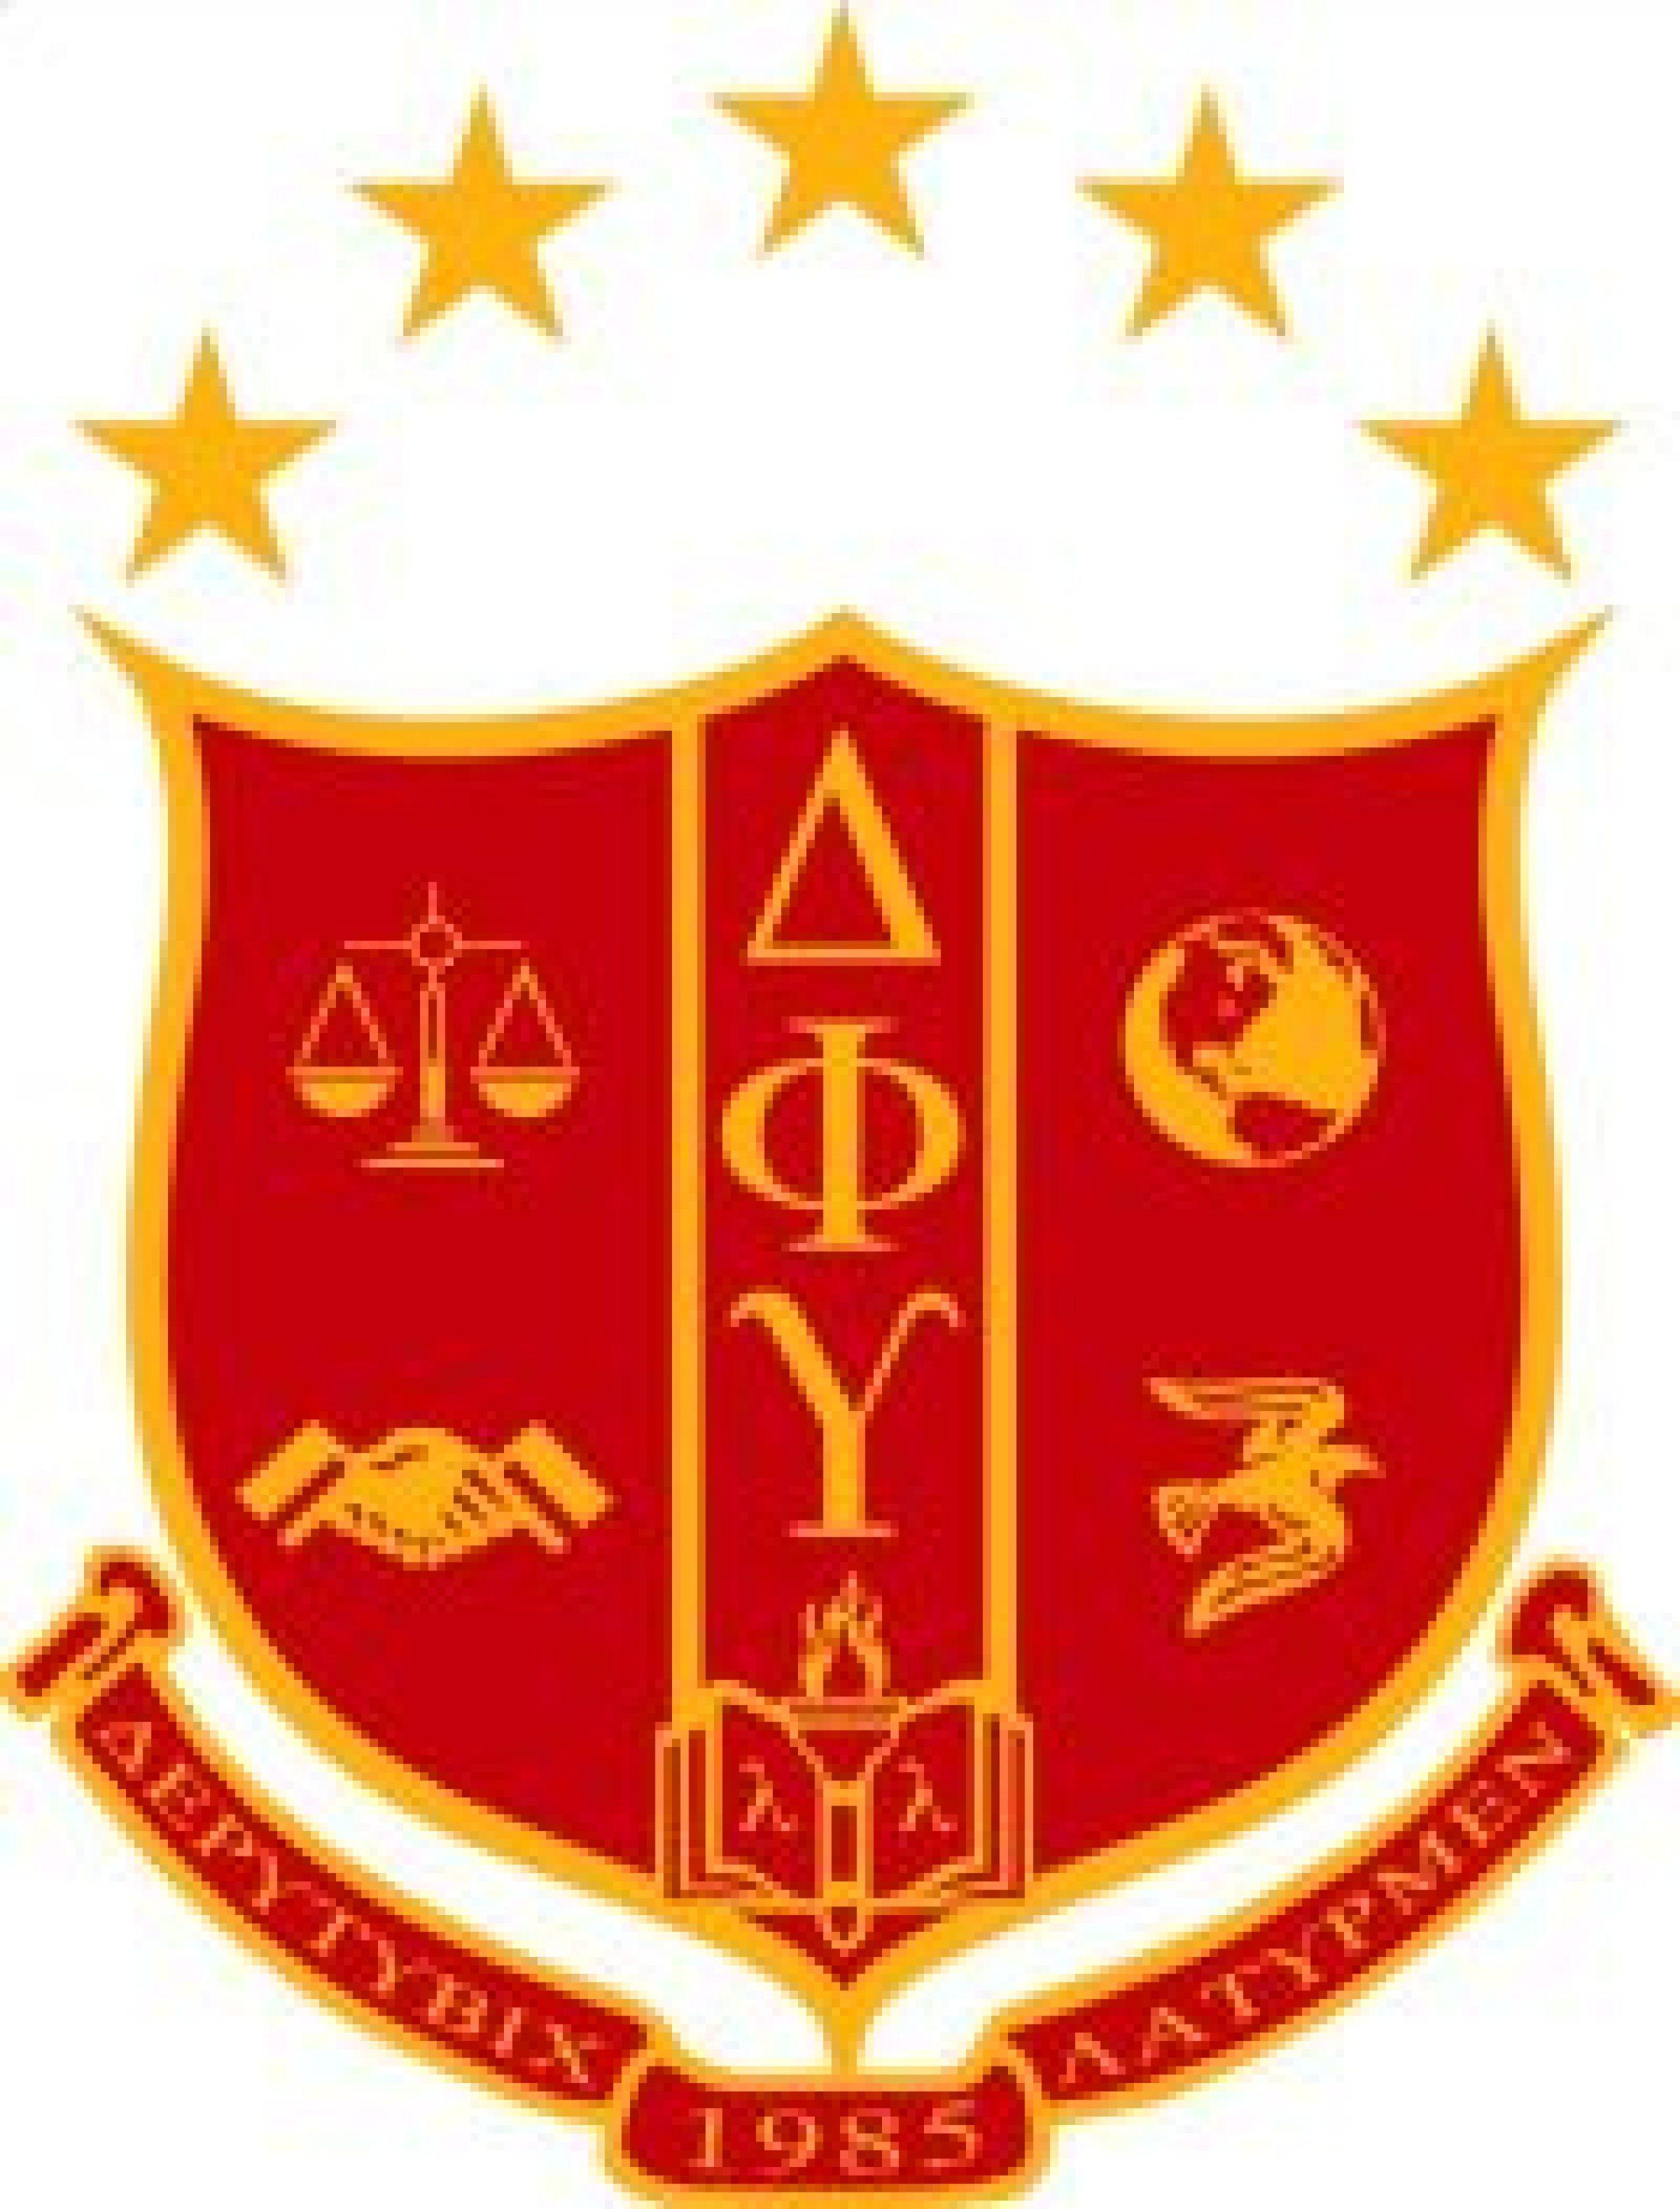 Delta Phi Upsilon Fraternity, Inc.